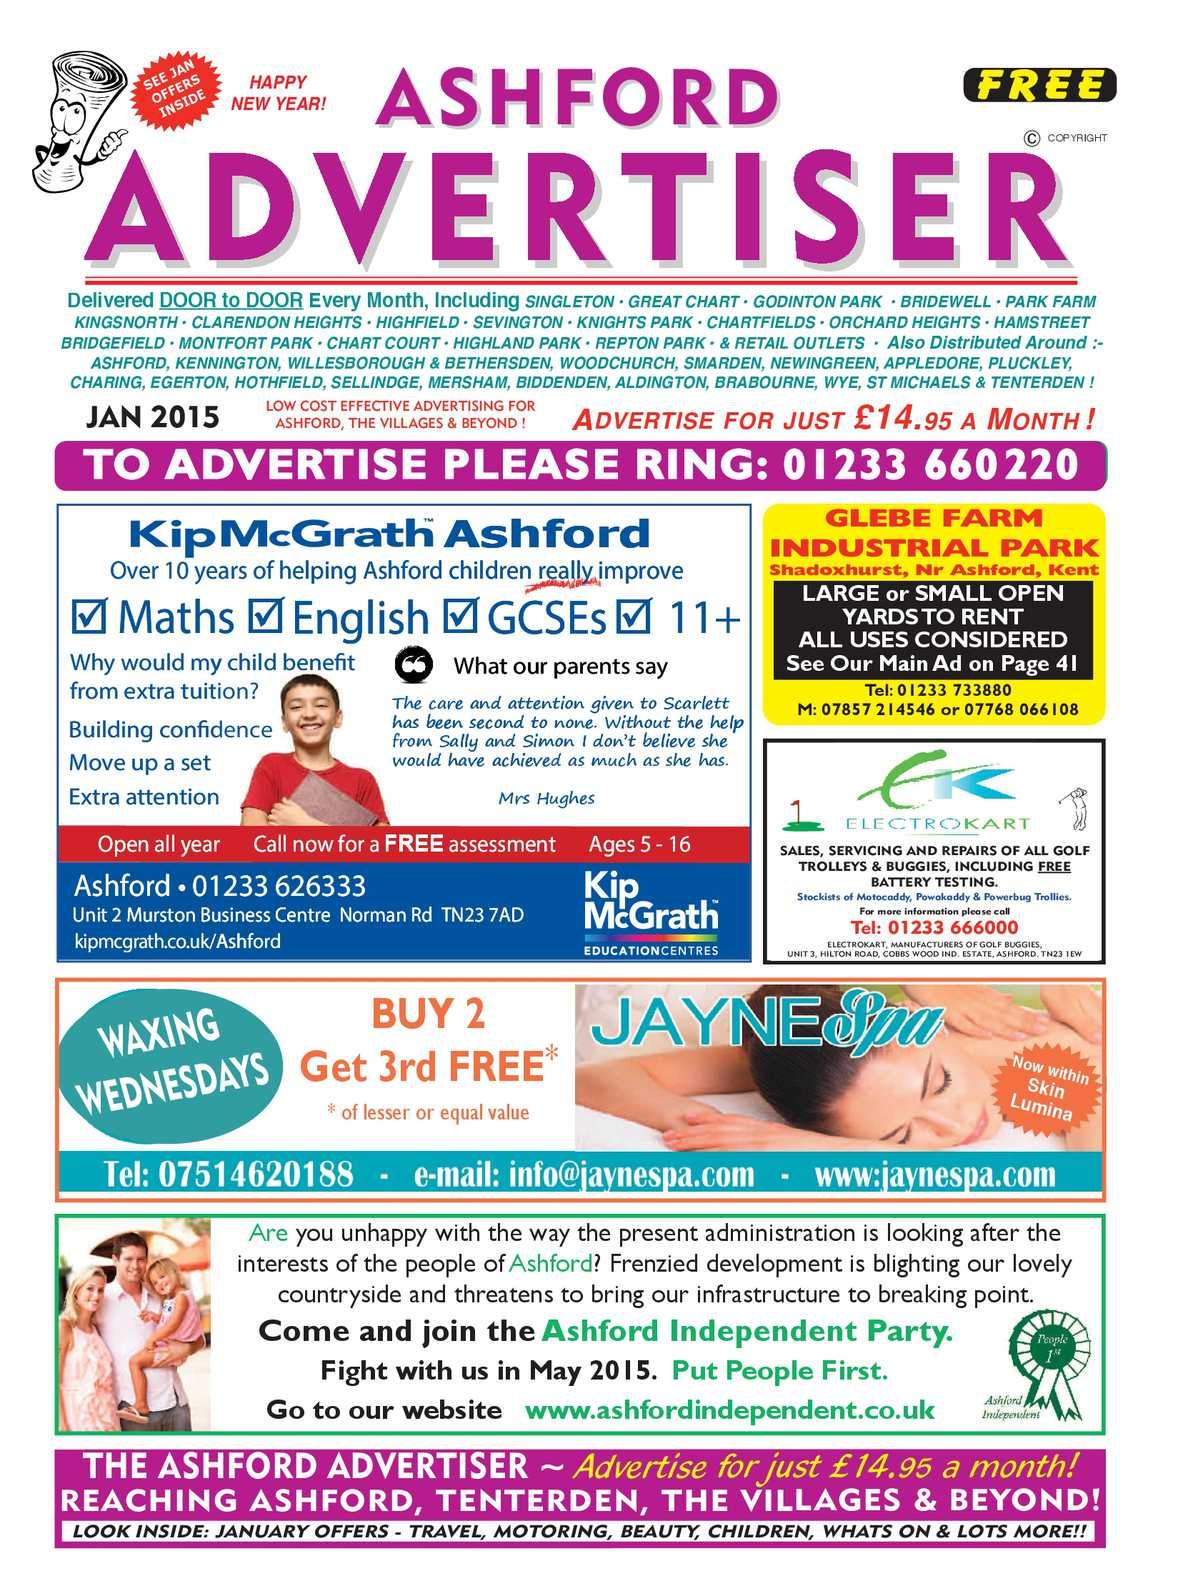 Calaméo - Ashford Advertiser